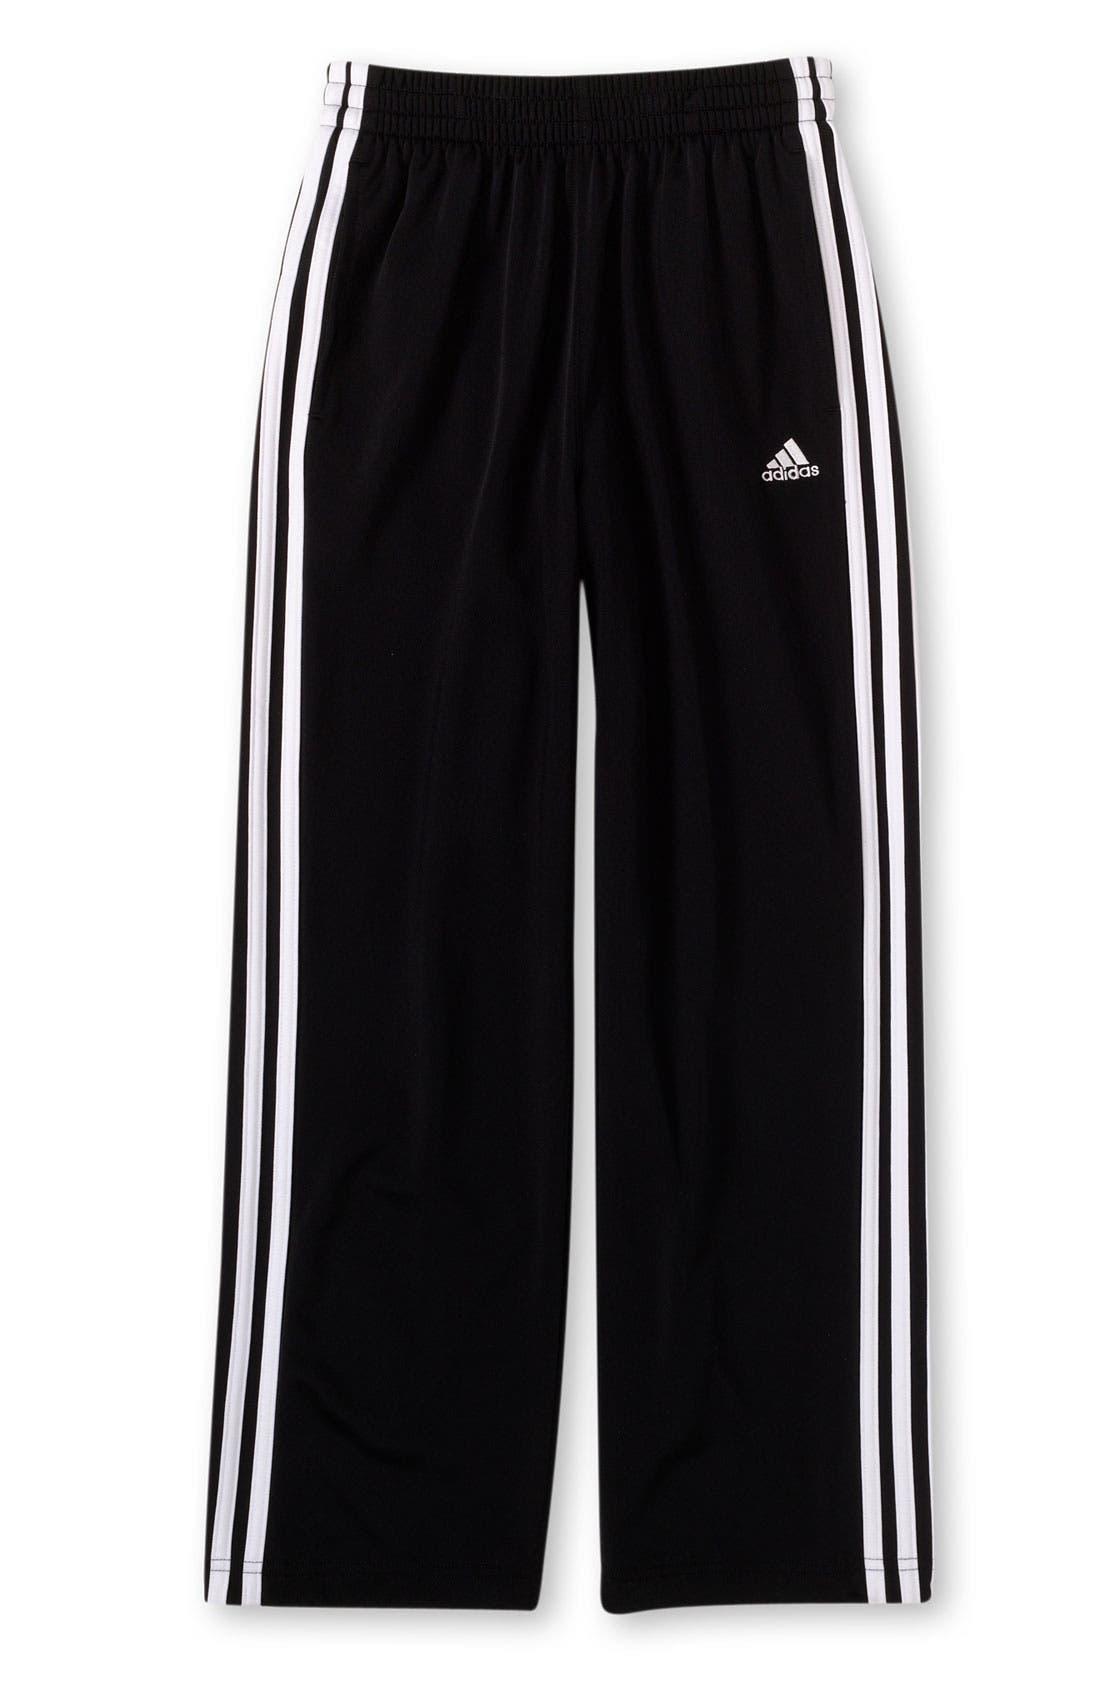 Main Image - adidas 3-Stripes Pants (Big Boys)